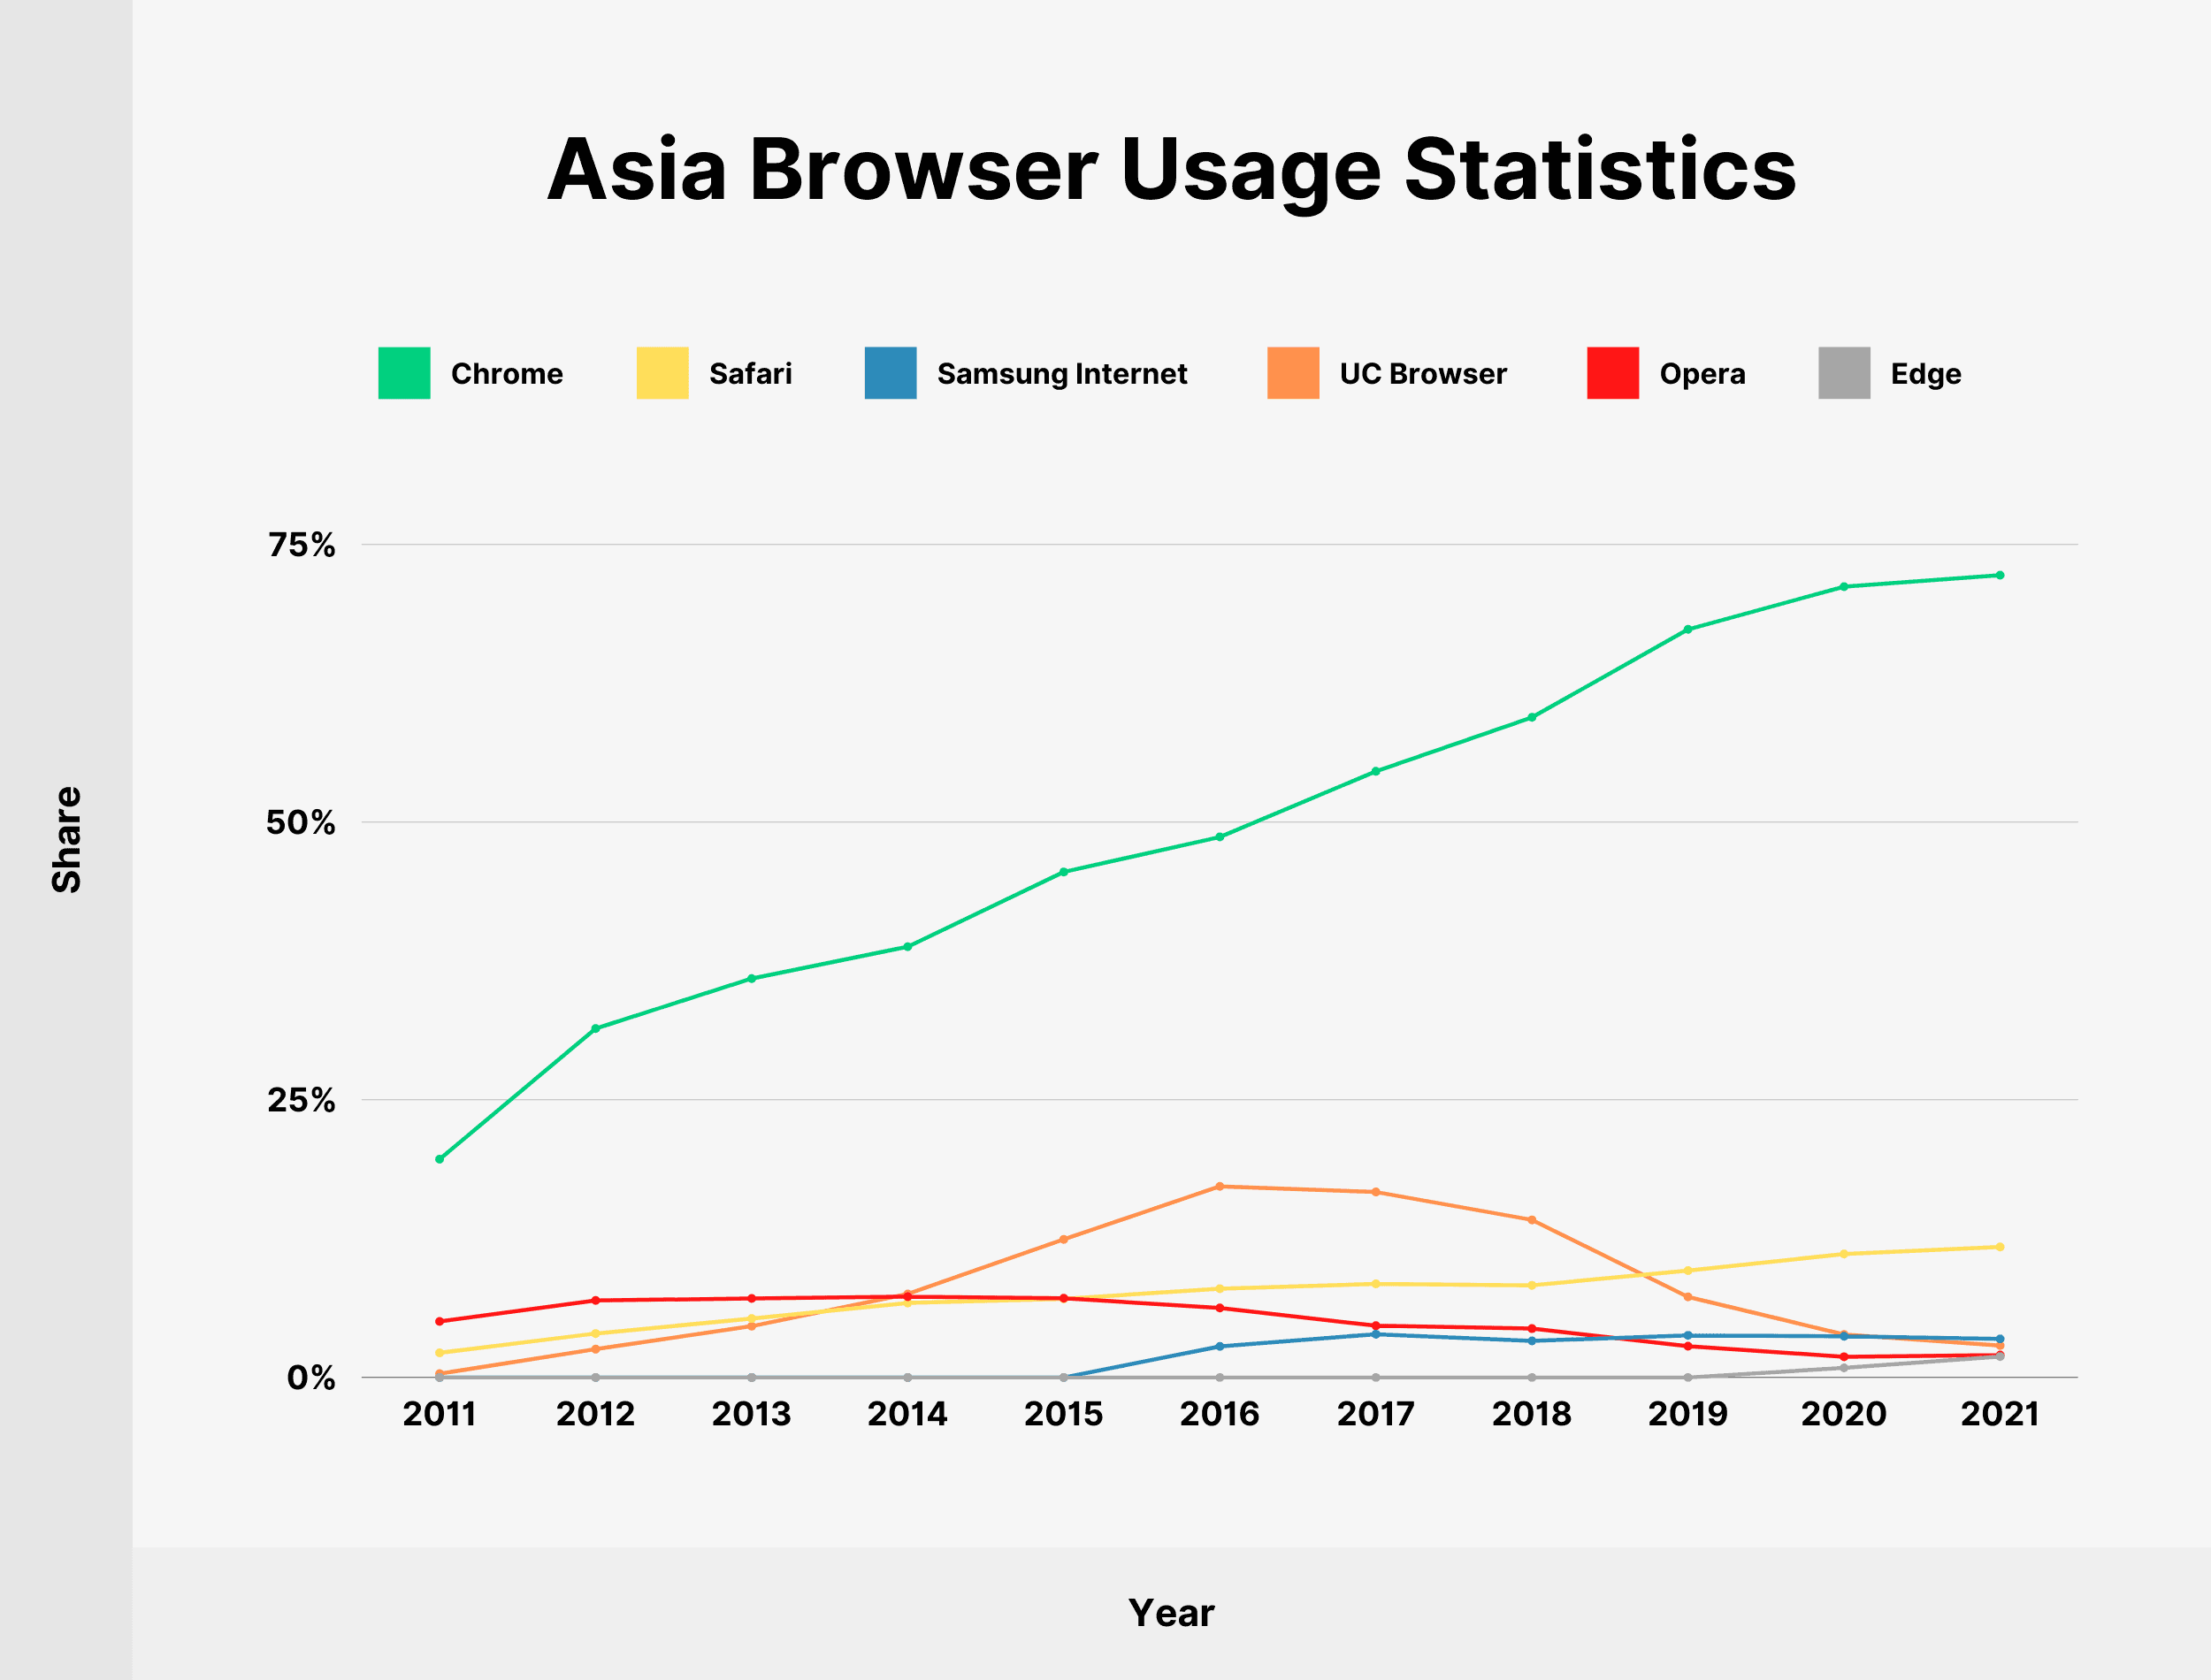 Asia Browser Usage Statistics